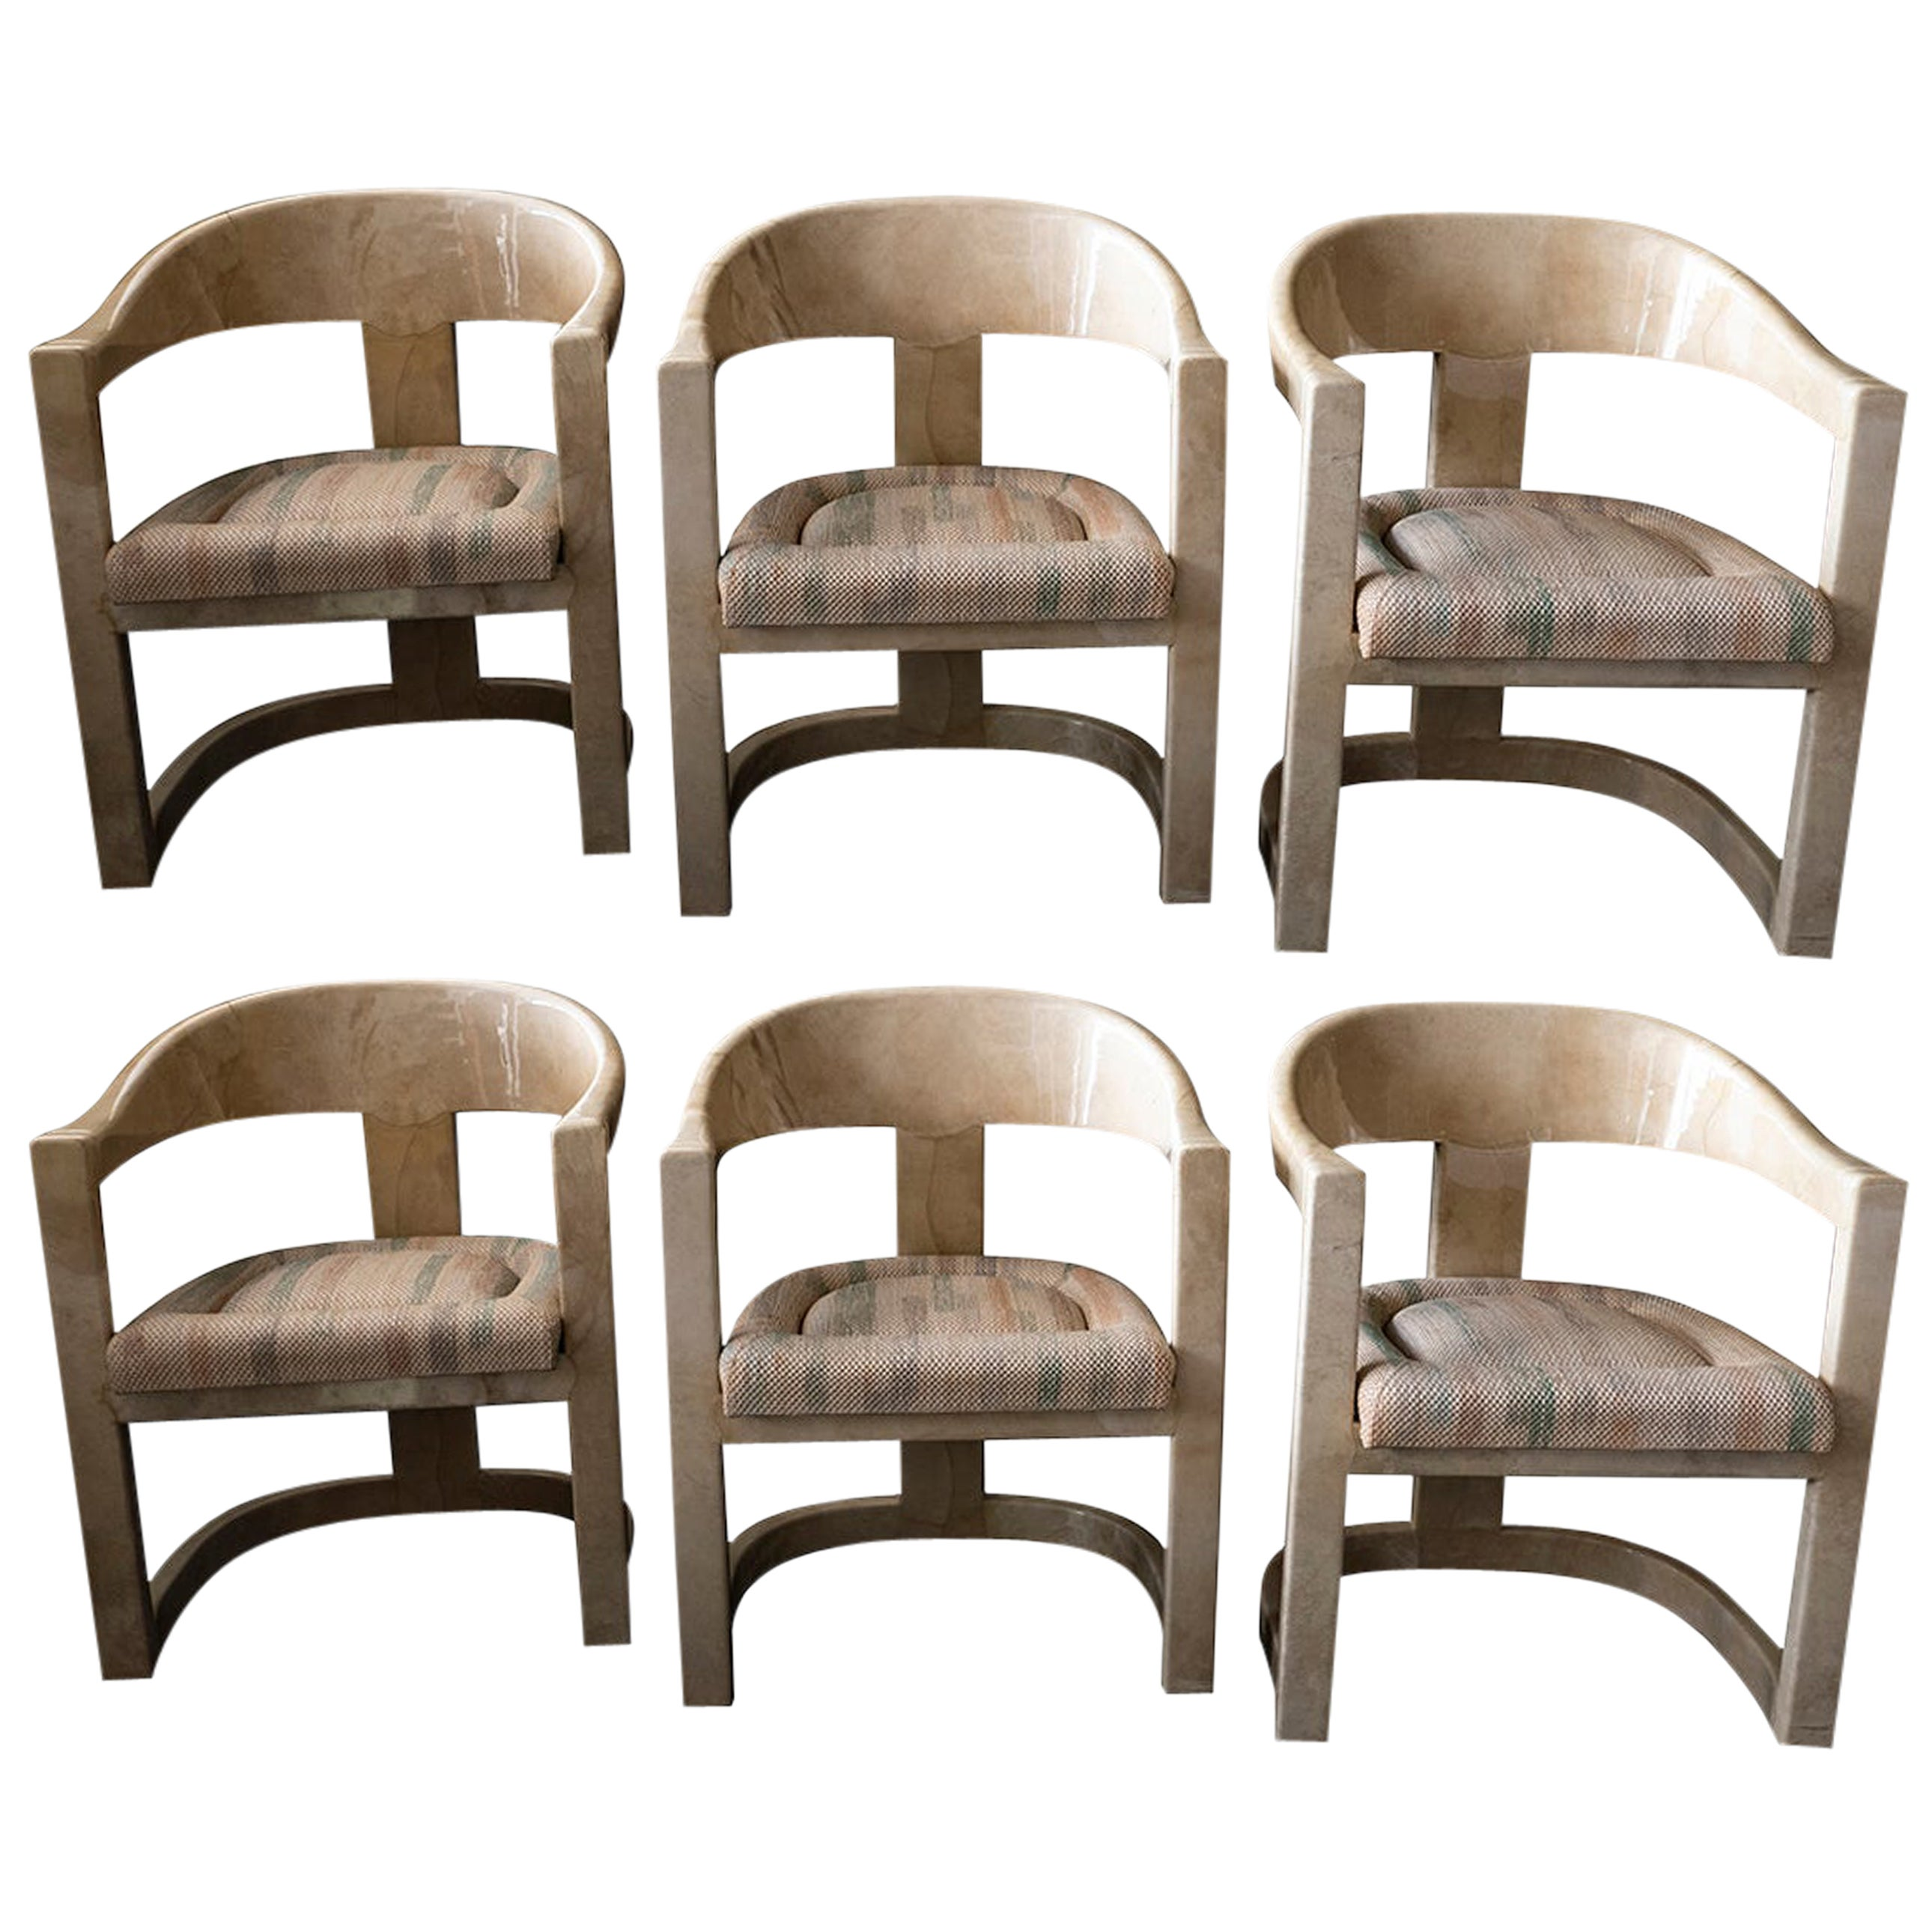 "Set of 6 American Modern Goatskin ""Onassis"" Chairs"